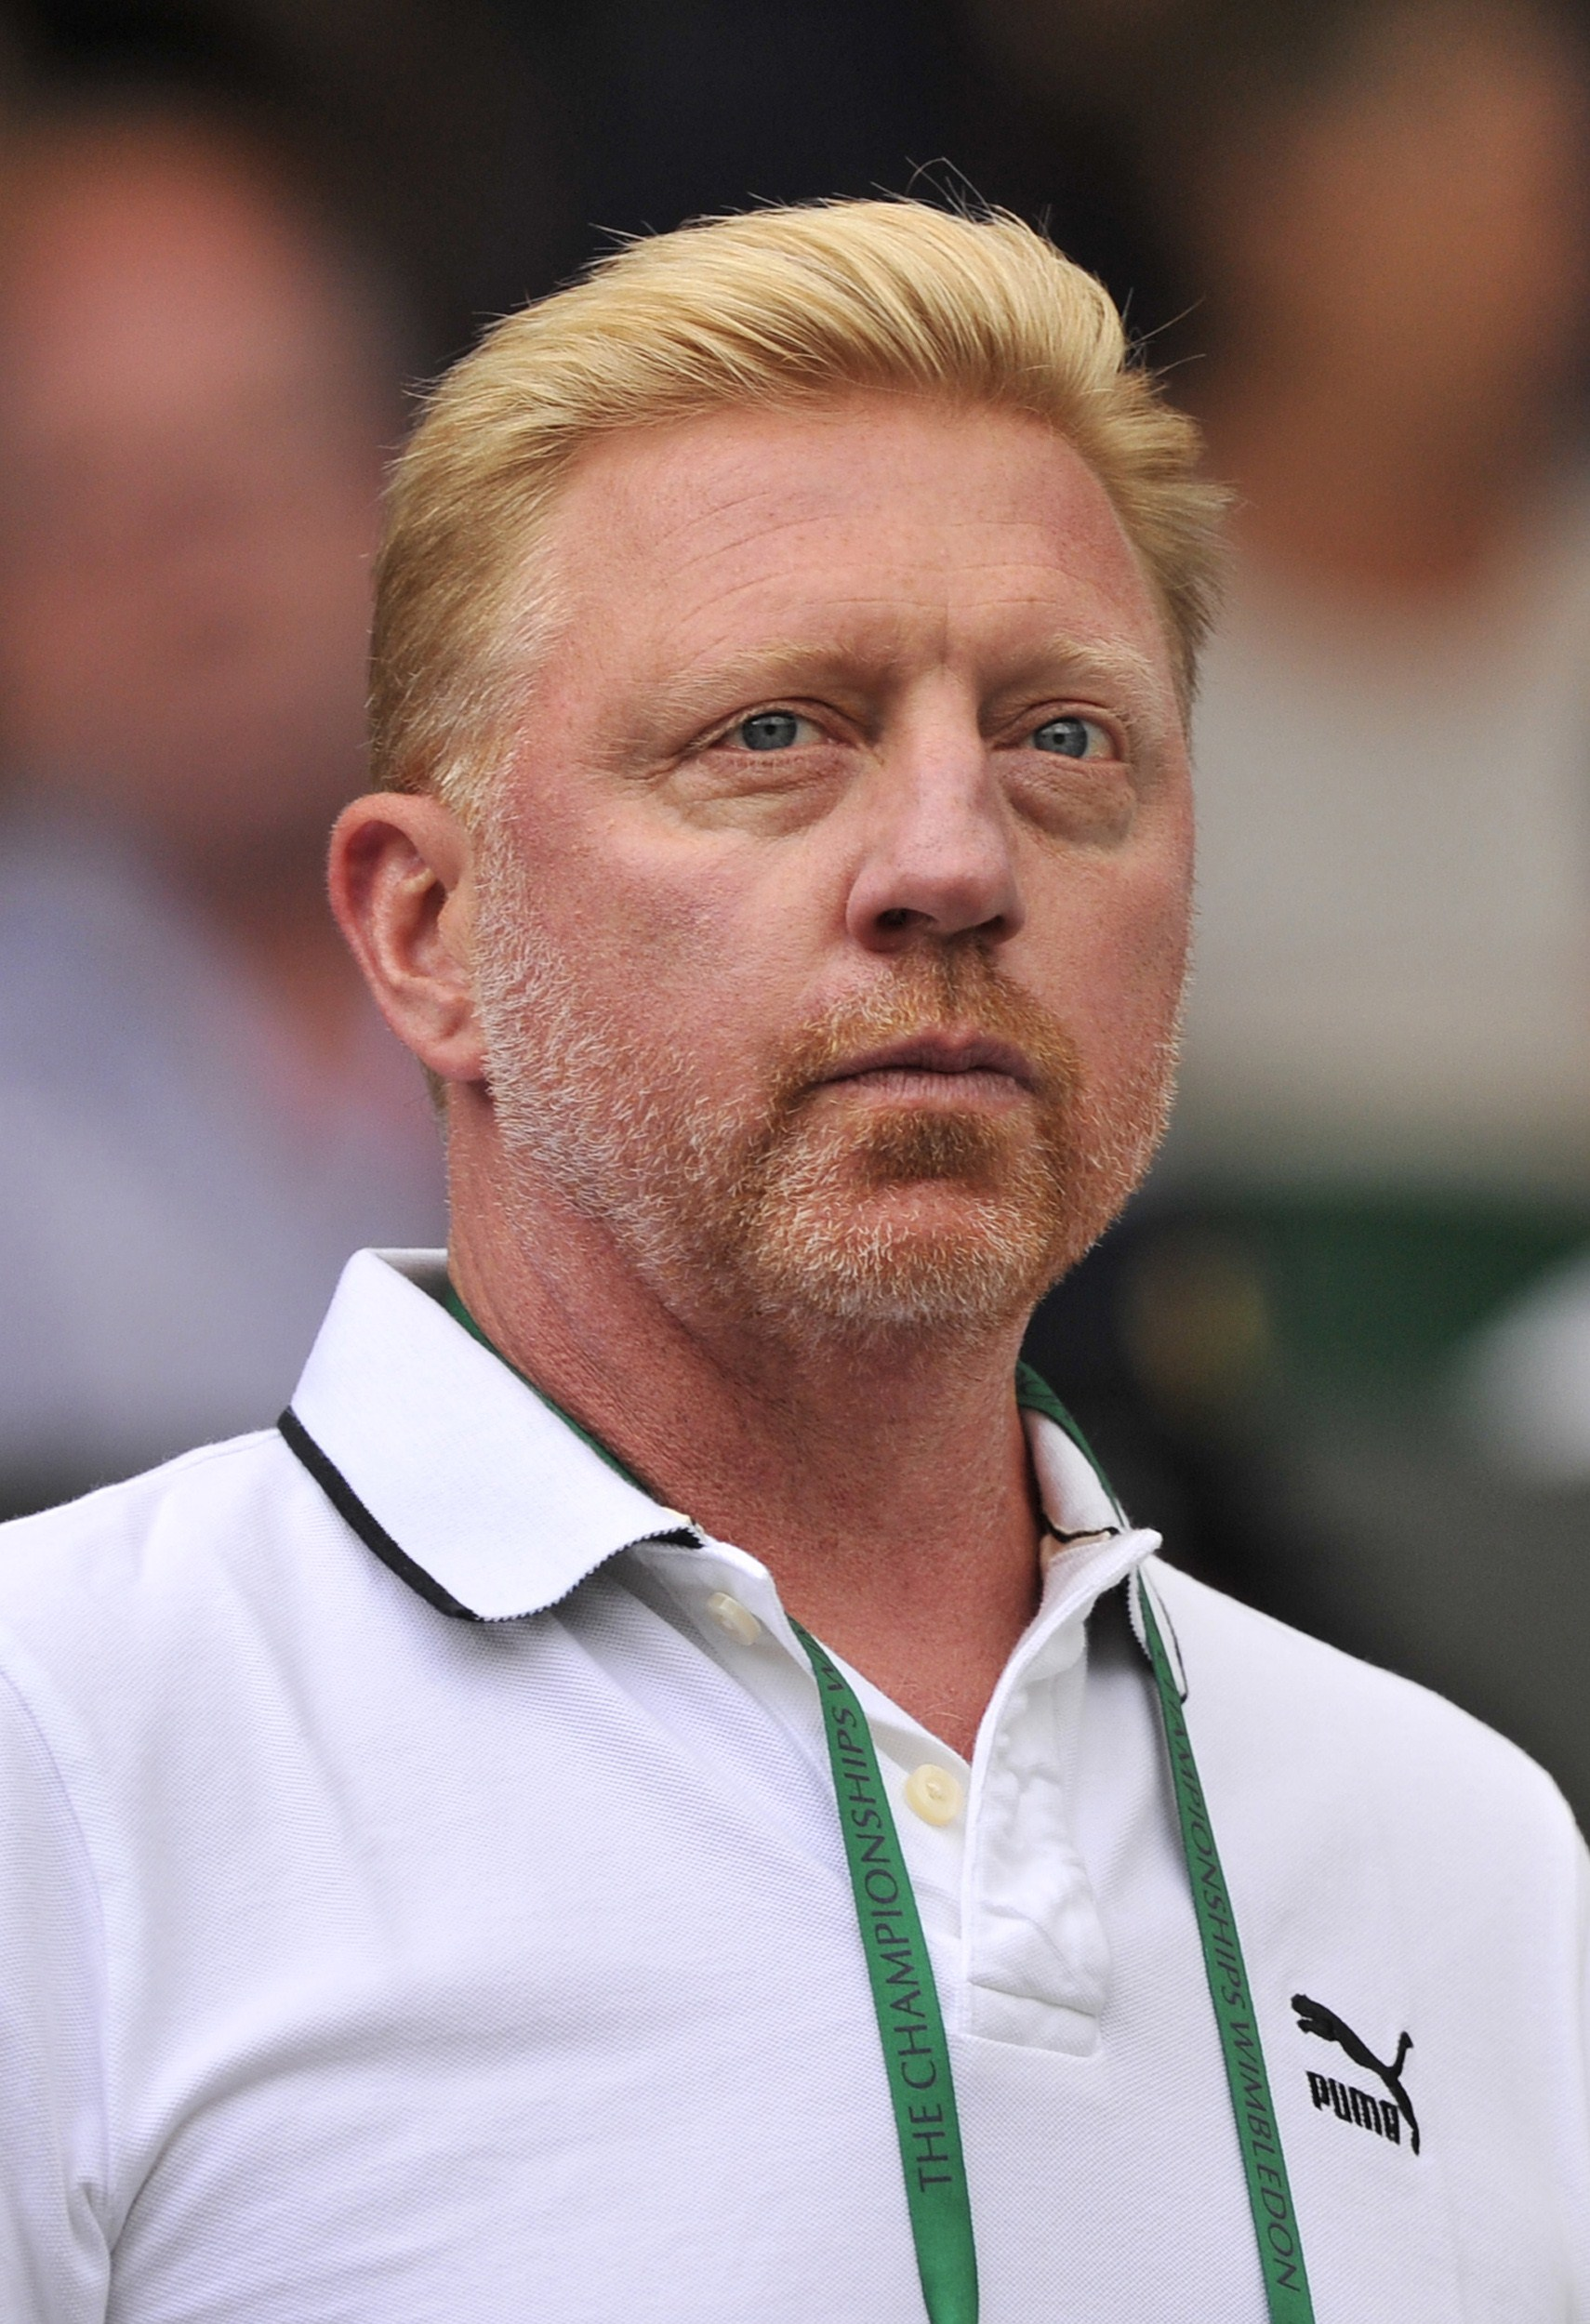 Becker Reaction to coaching job surprised me CNN Video